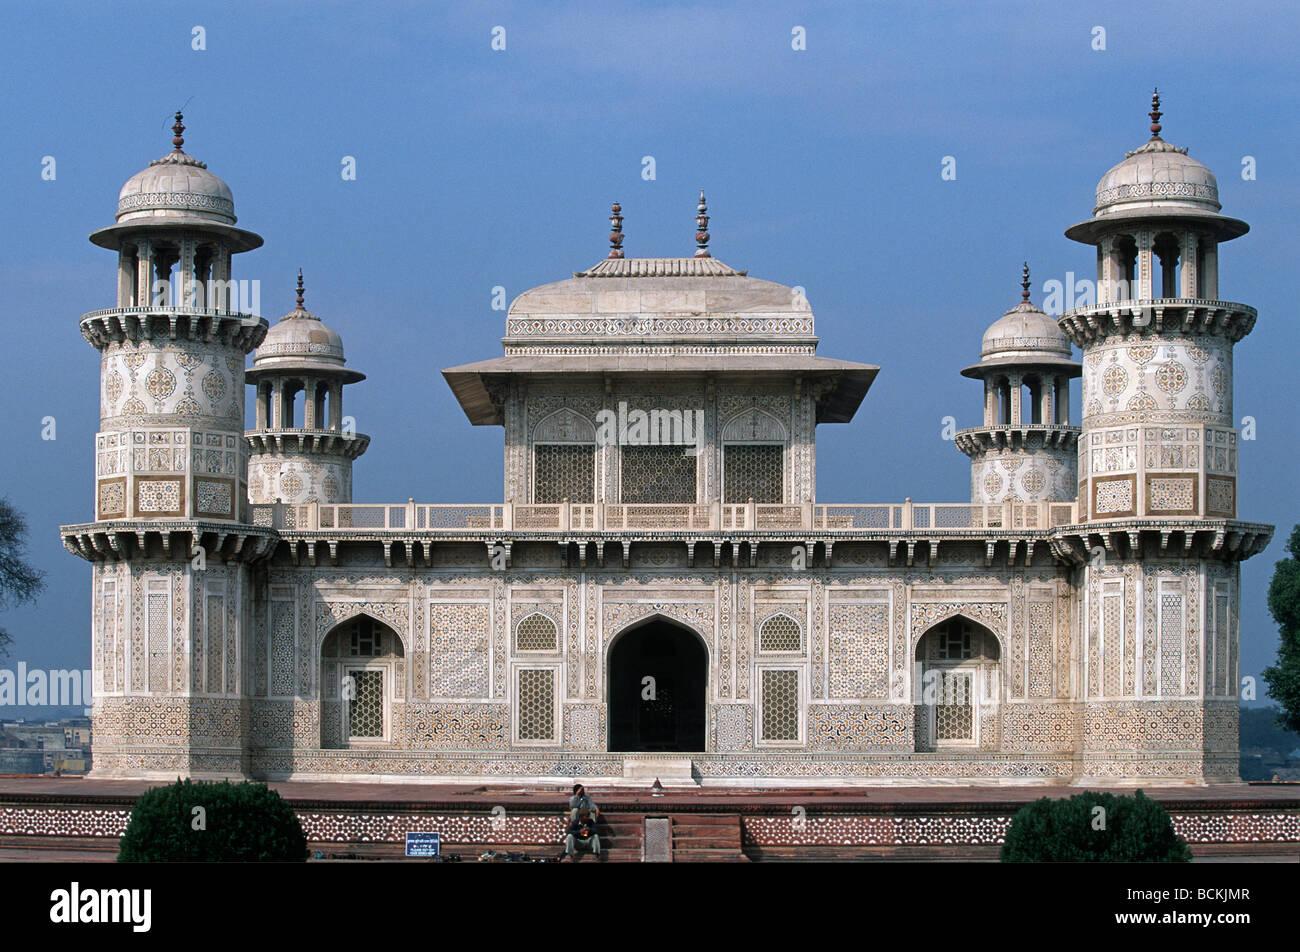 India Uttar Pradesh Agra Itimad ud Daulah mausoleum 1626 Tomb of Mirza Ghiyas Beg Chief Minister Stock Photo